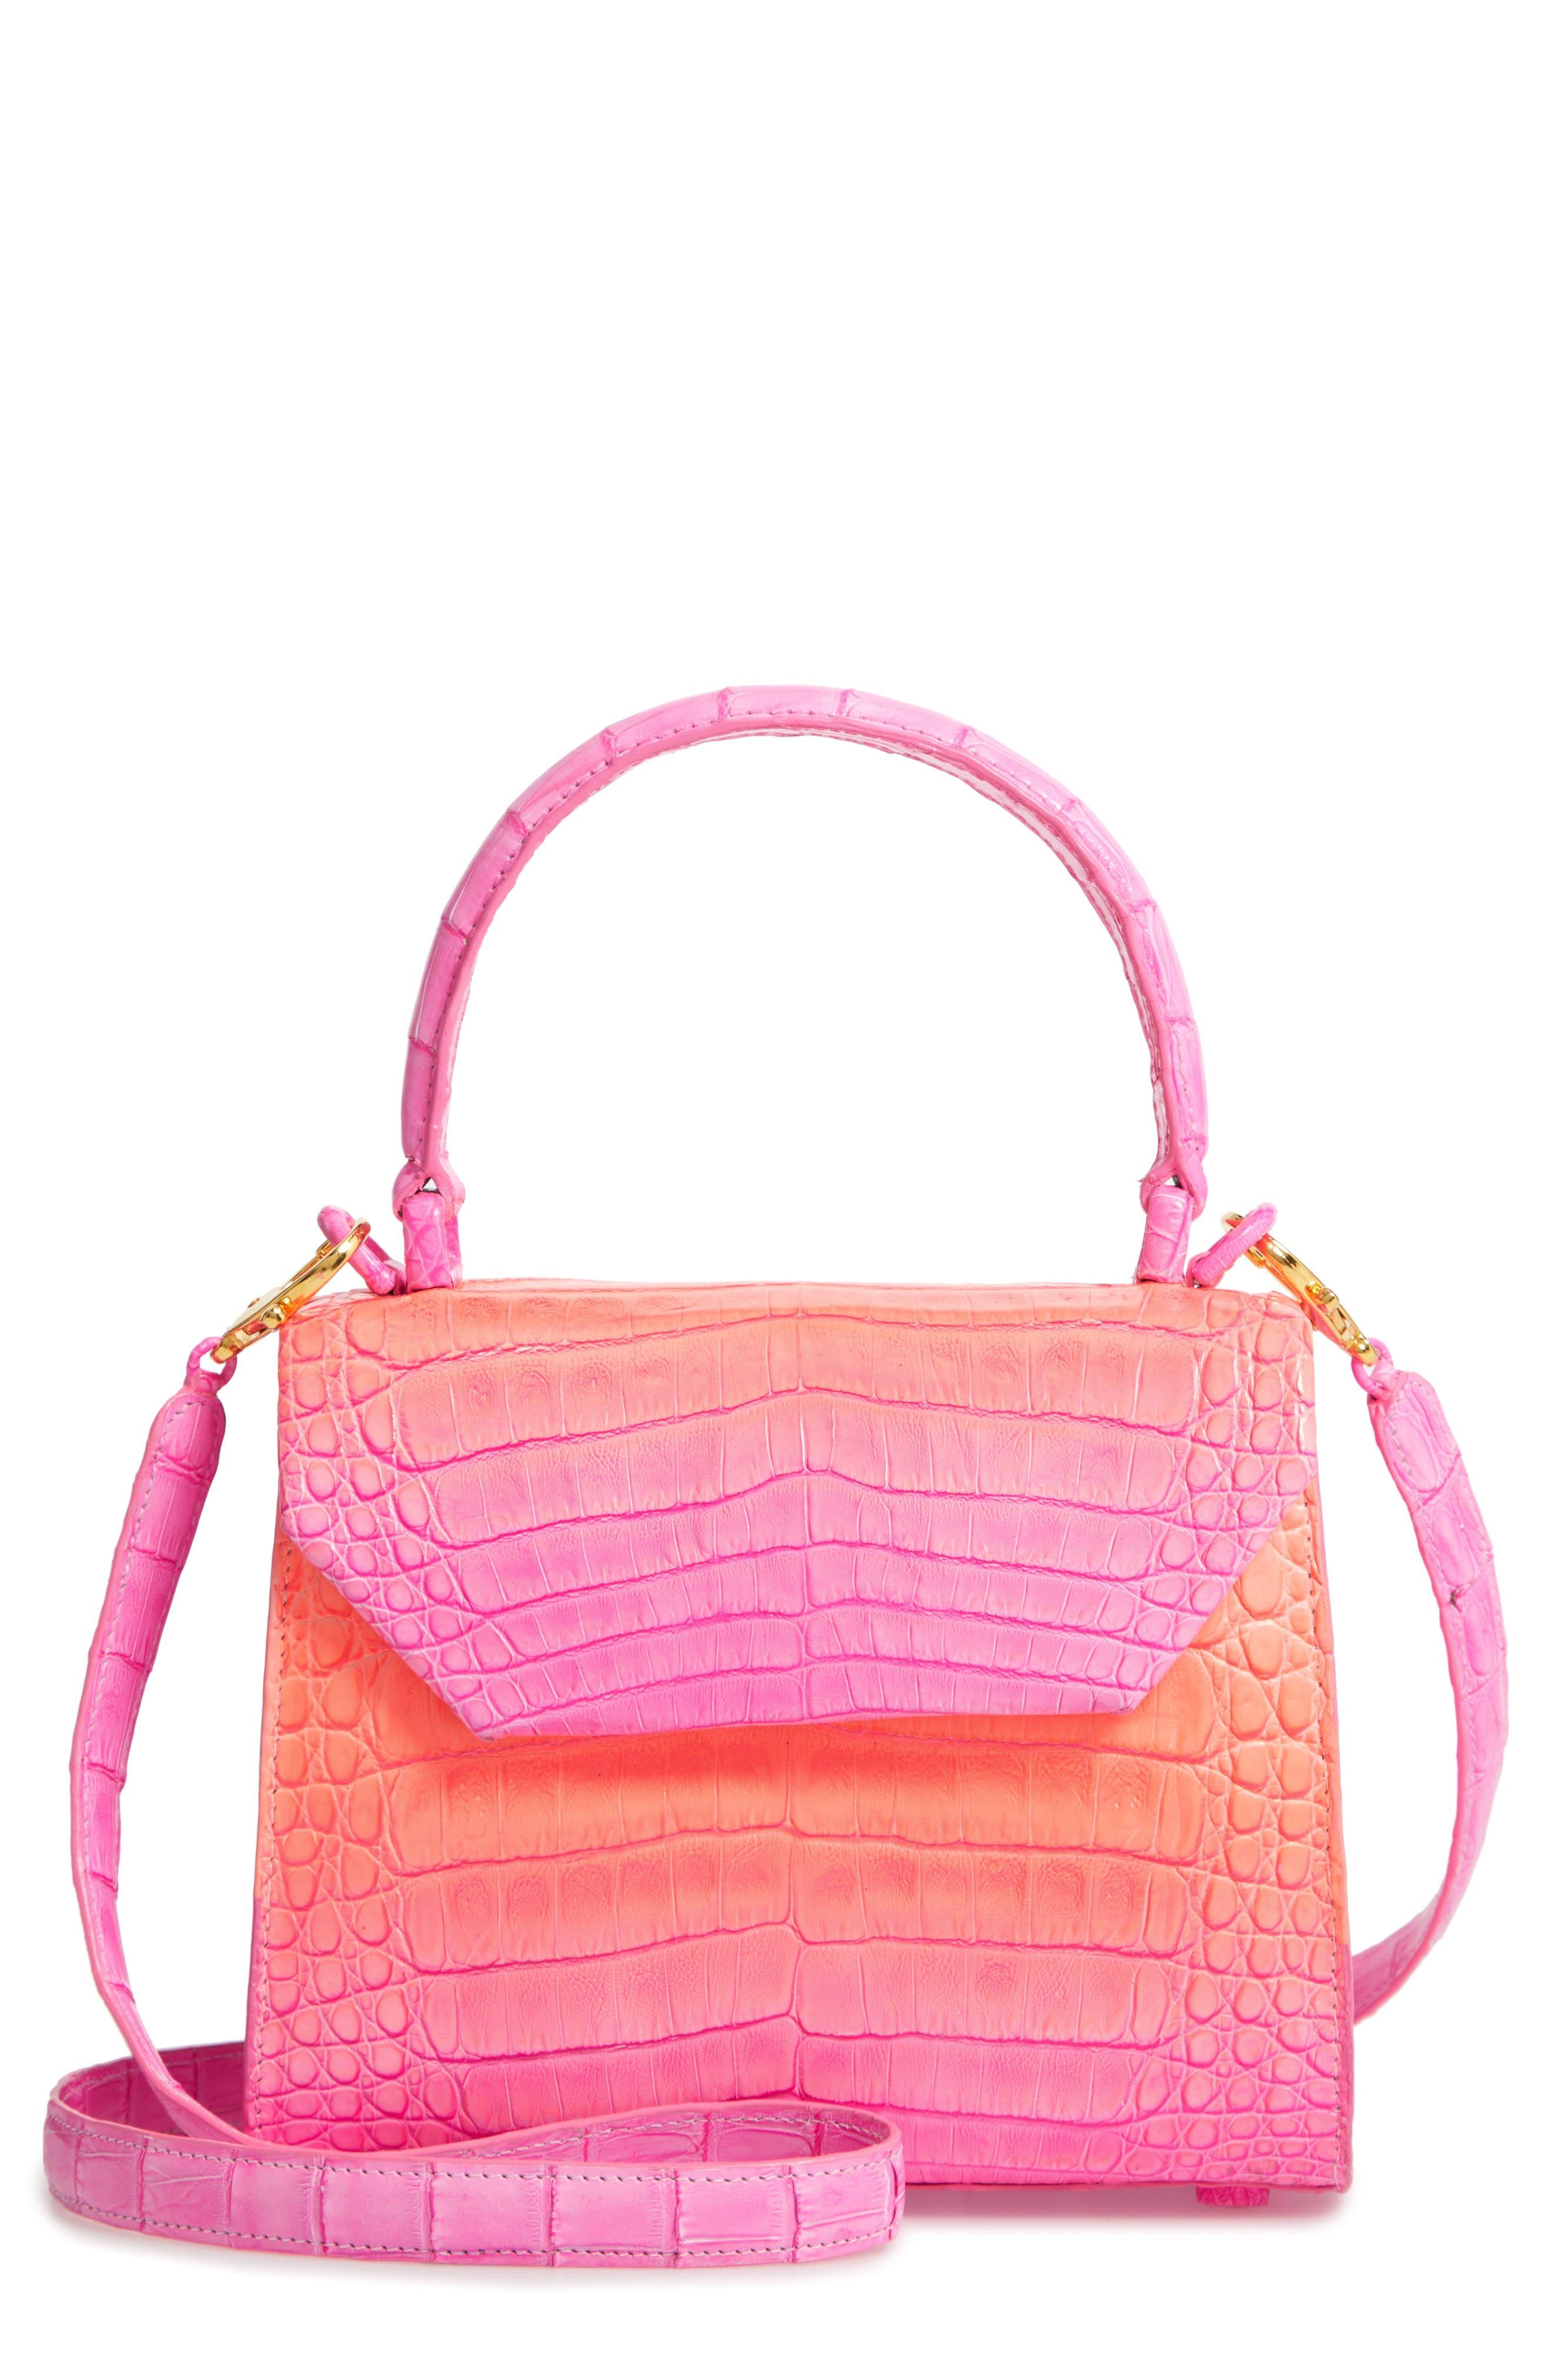 NANCY GONZALEZ, Mini Lily Genuine Crocodile Crossbody Bag, Main thumbnail 1, color, PINK DEGRADE